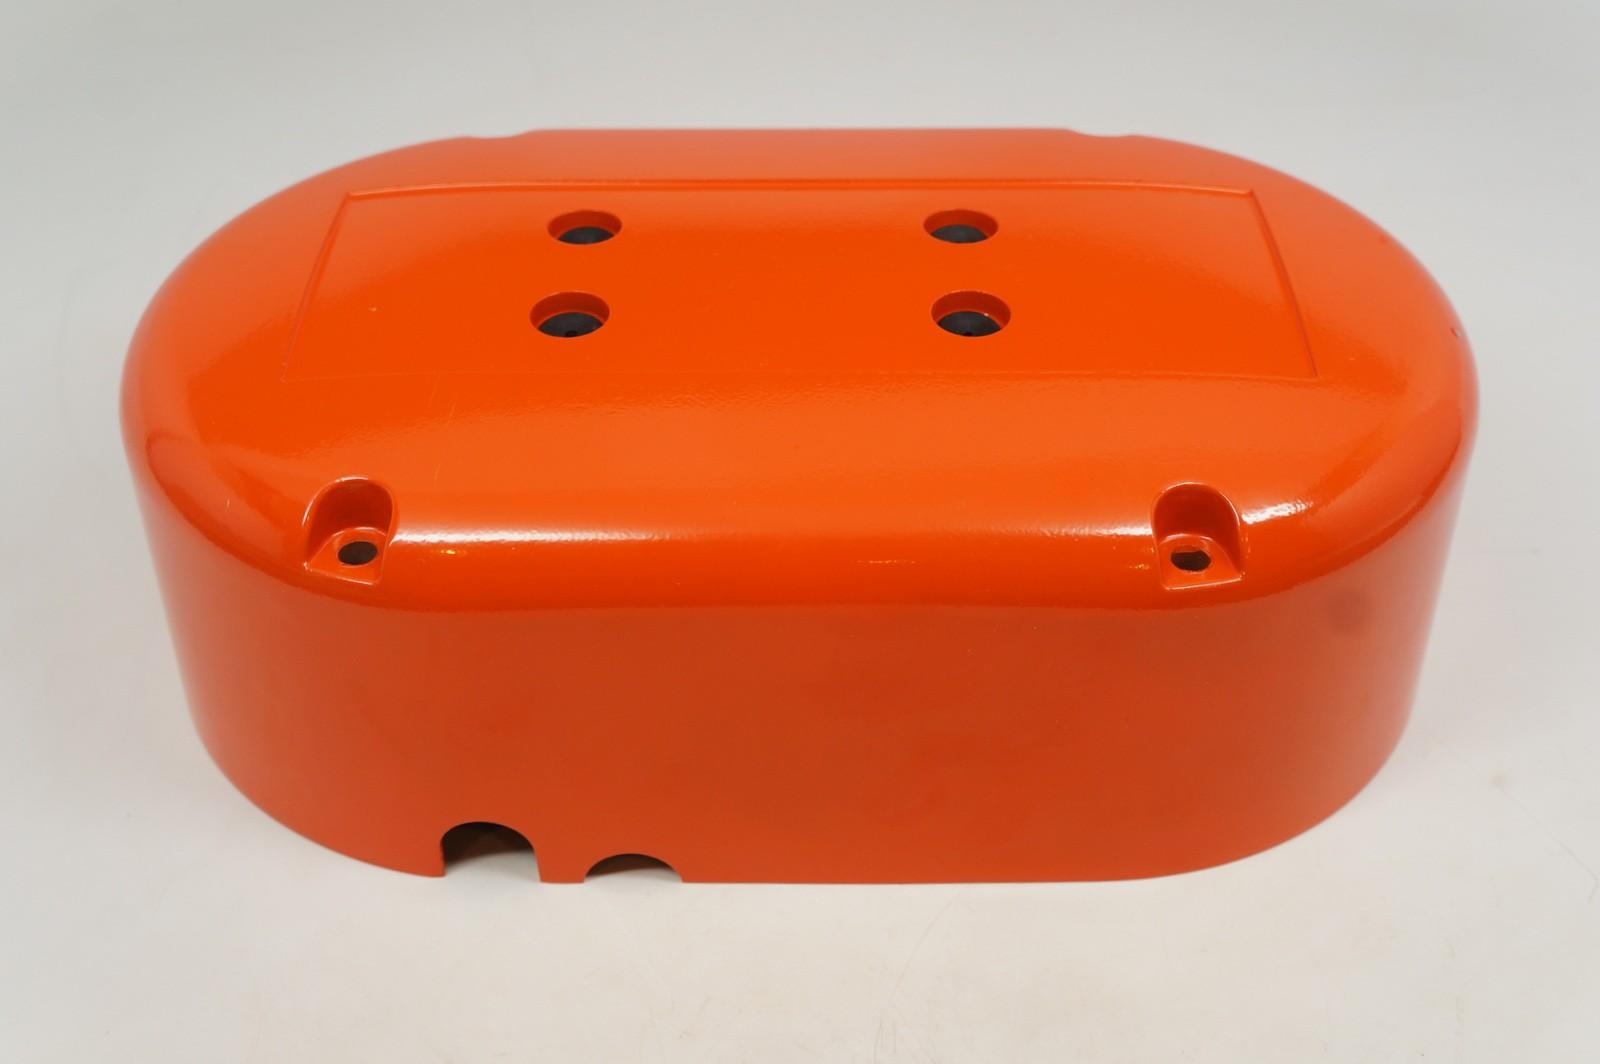 36008C - CVR BACK FRAME Orange 627-130